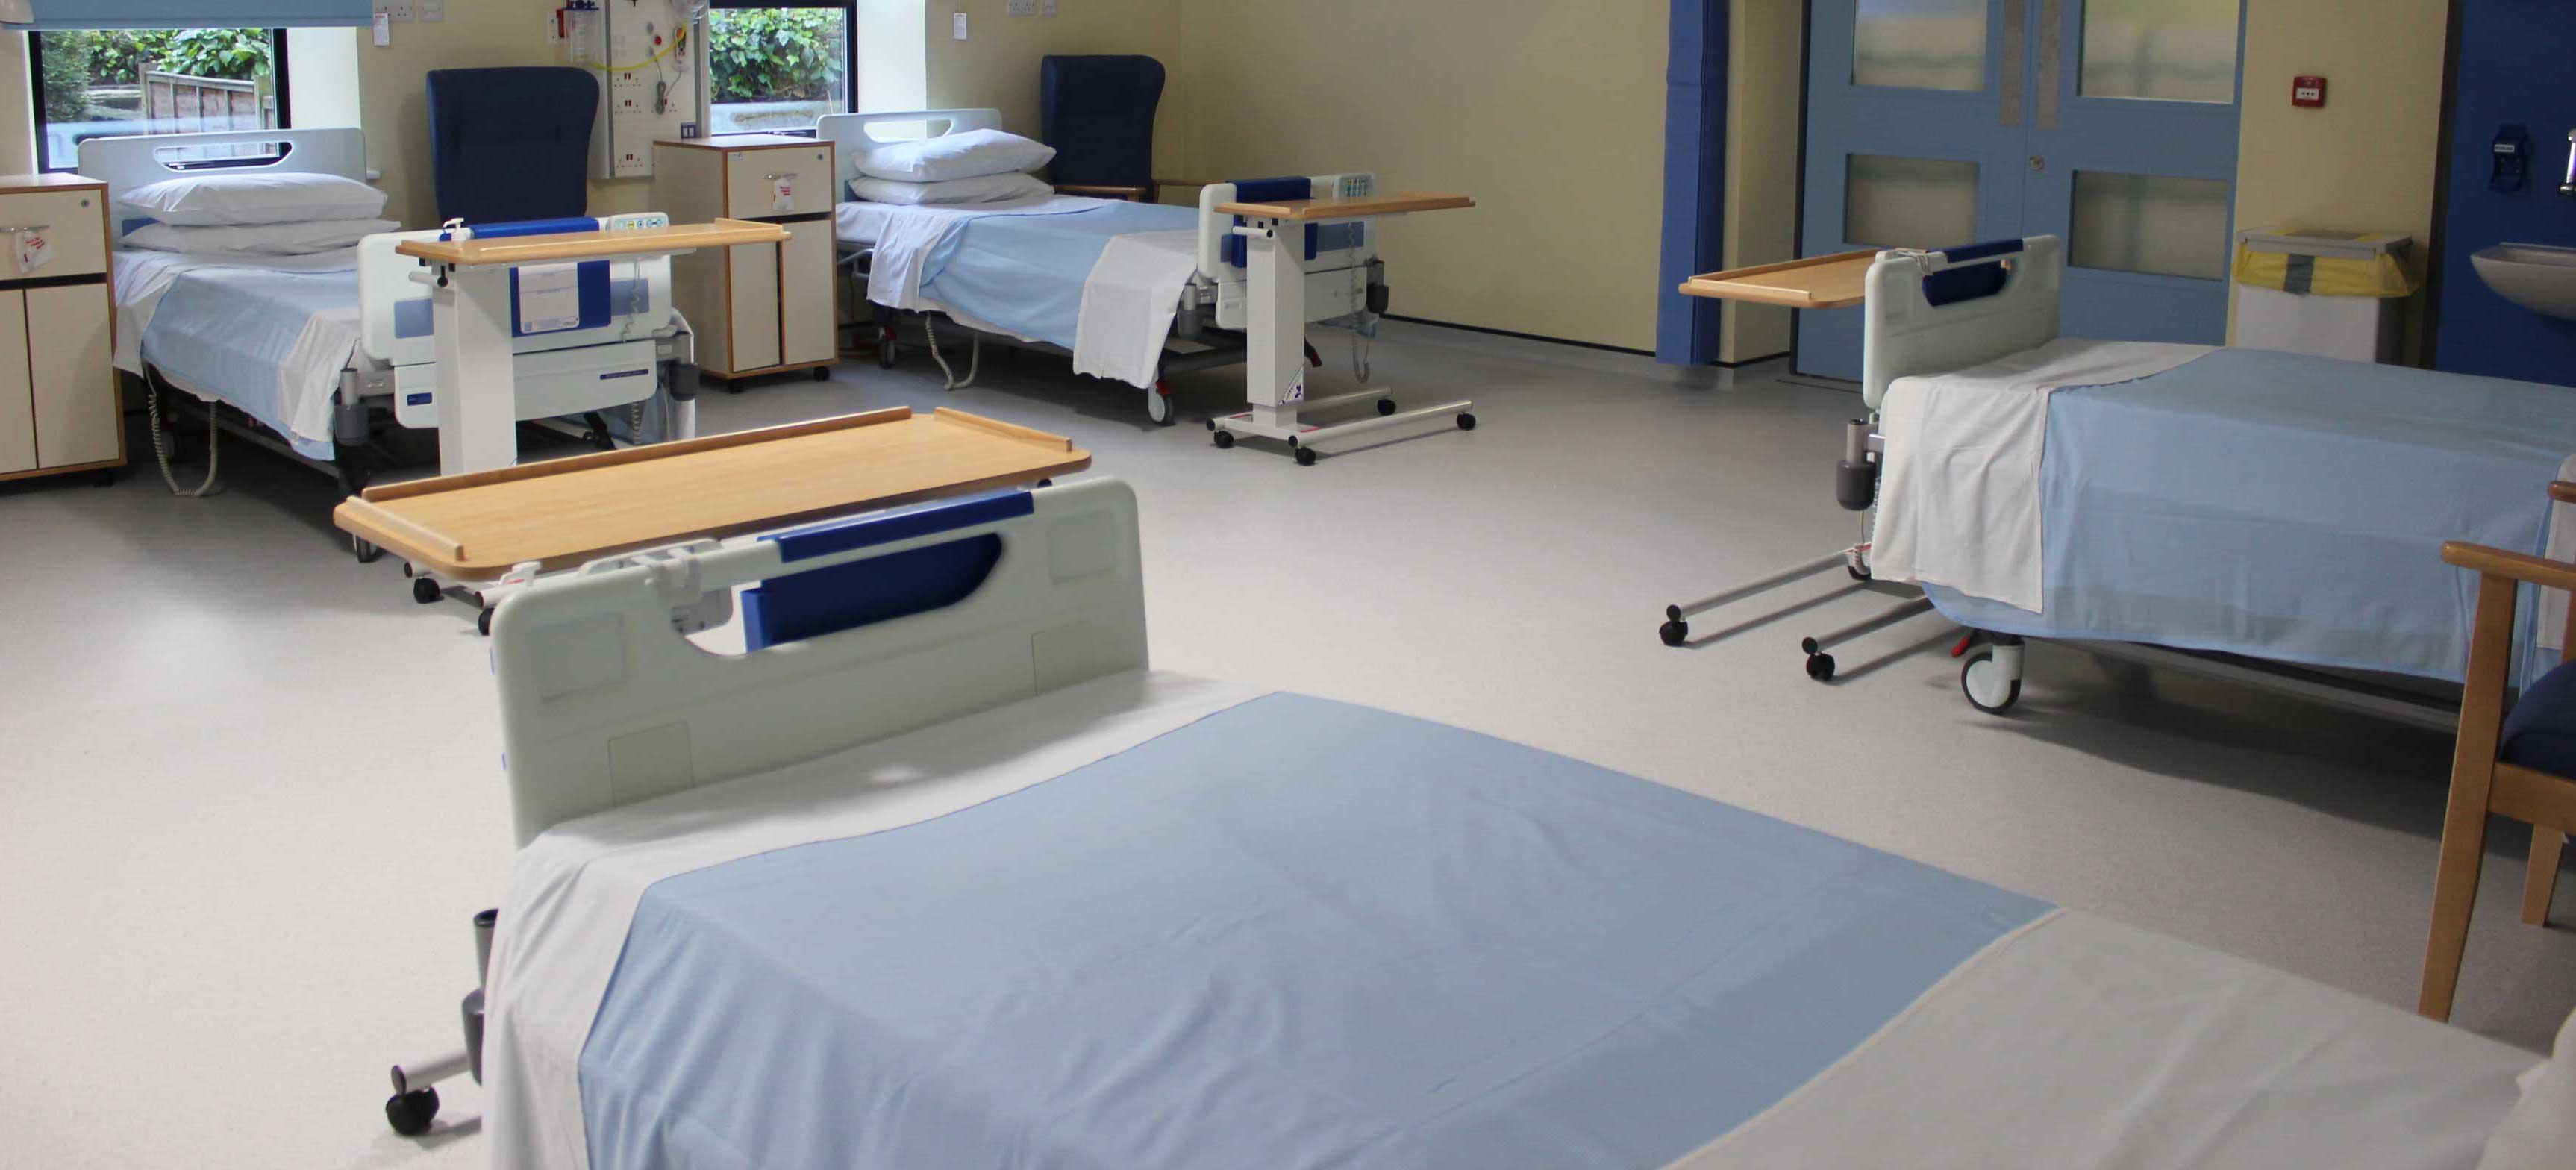 Hospital Design Room For Improvement